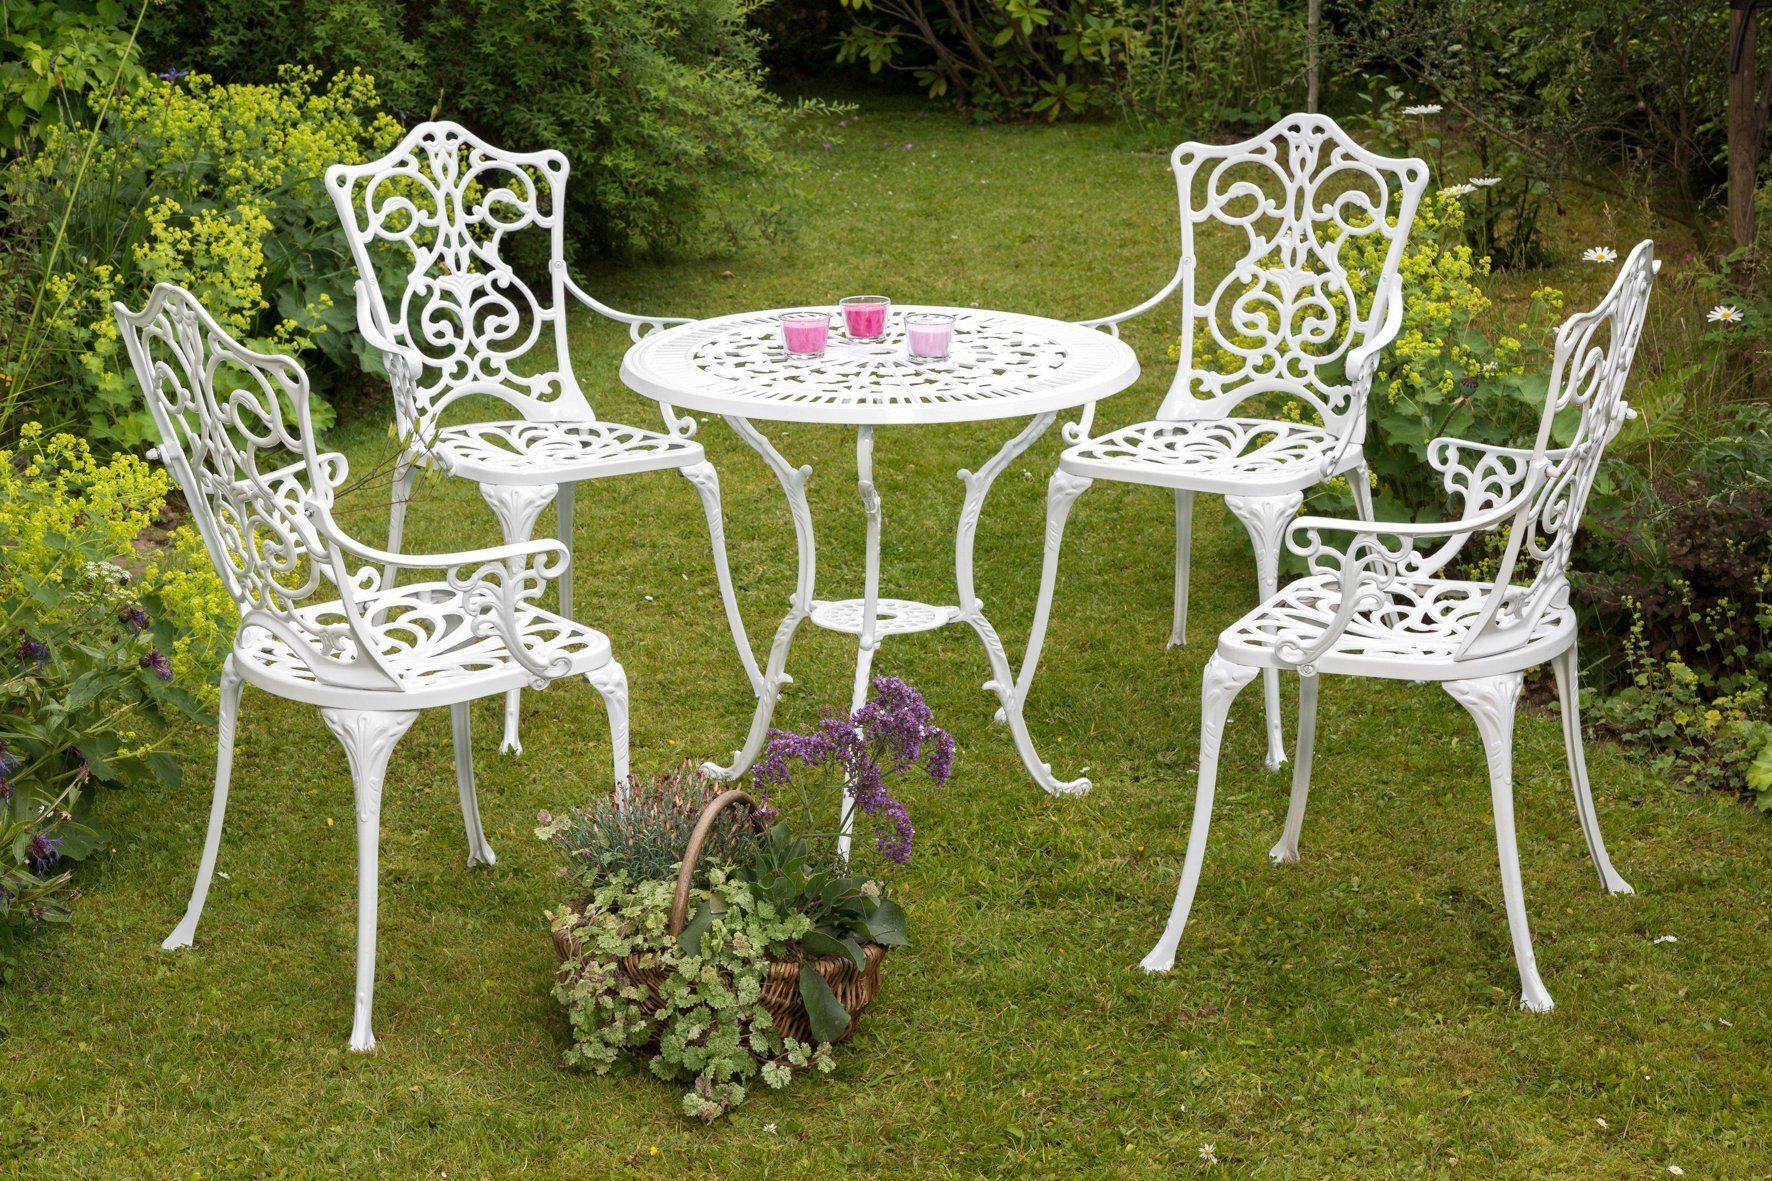 Tafel 70 Cm : ≥ sieger tuin tafel cm d grijs leisteen decor